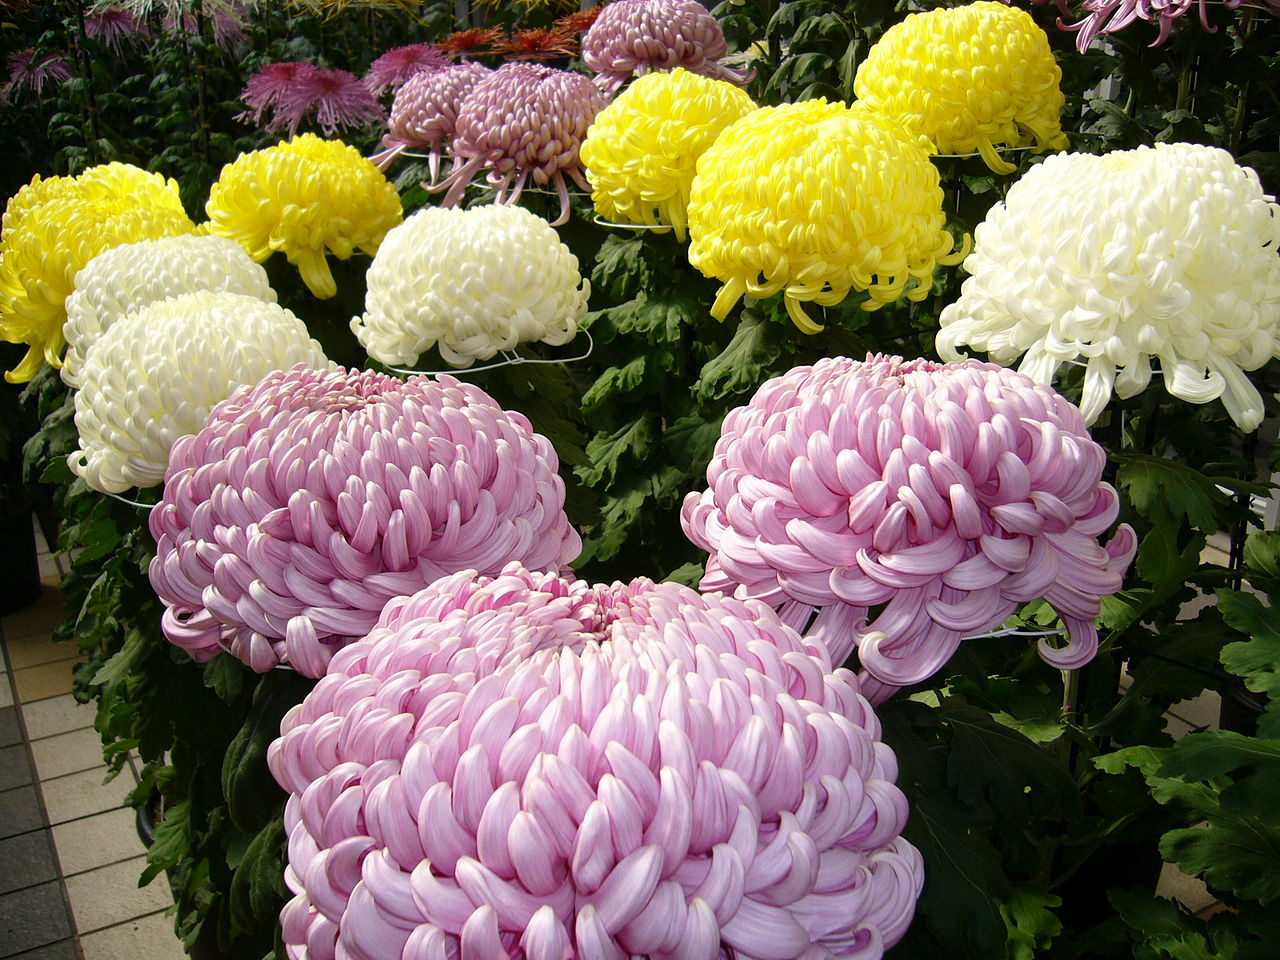 Chrysanthemum: National Flower of Japan